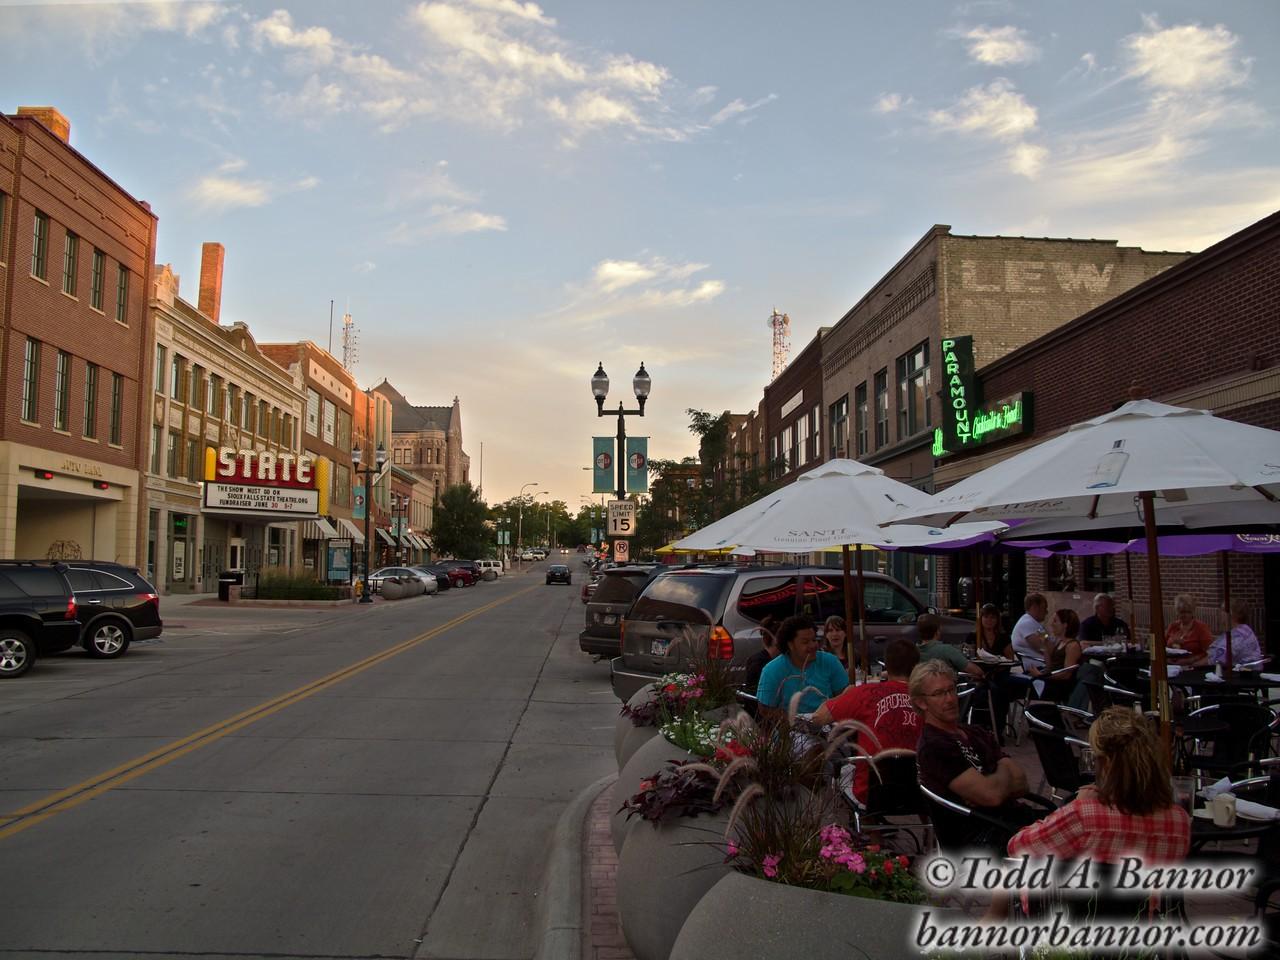 Sidewalk café on Phillips Avenue. Downtown Sioux Falls, South Dakota